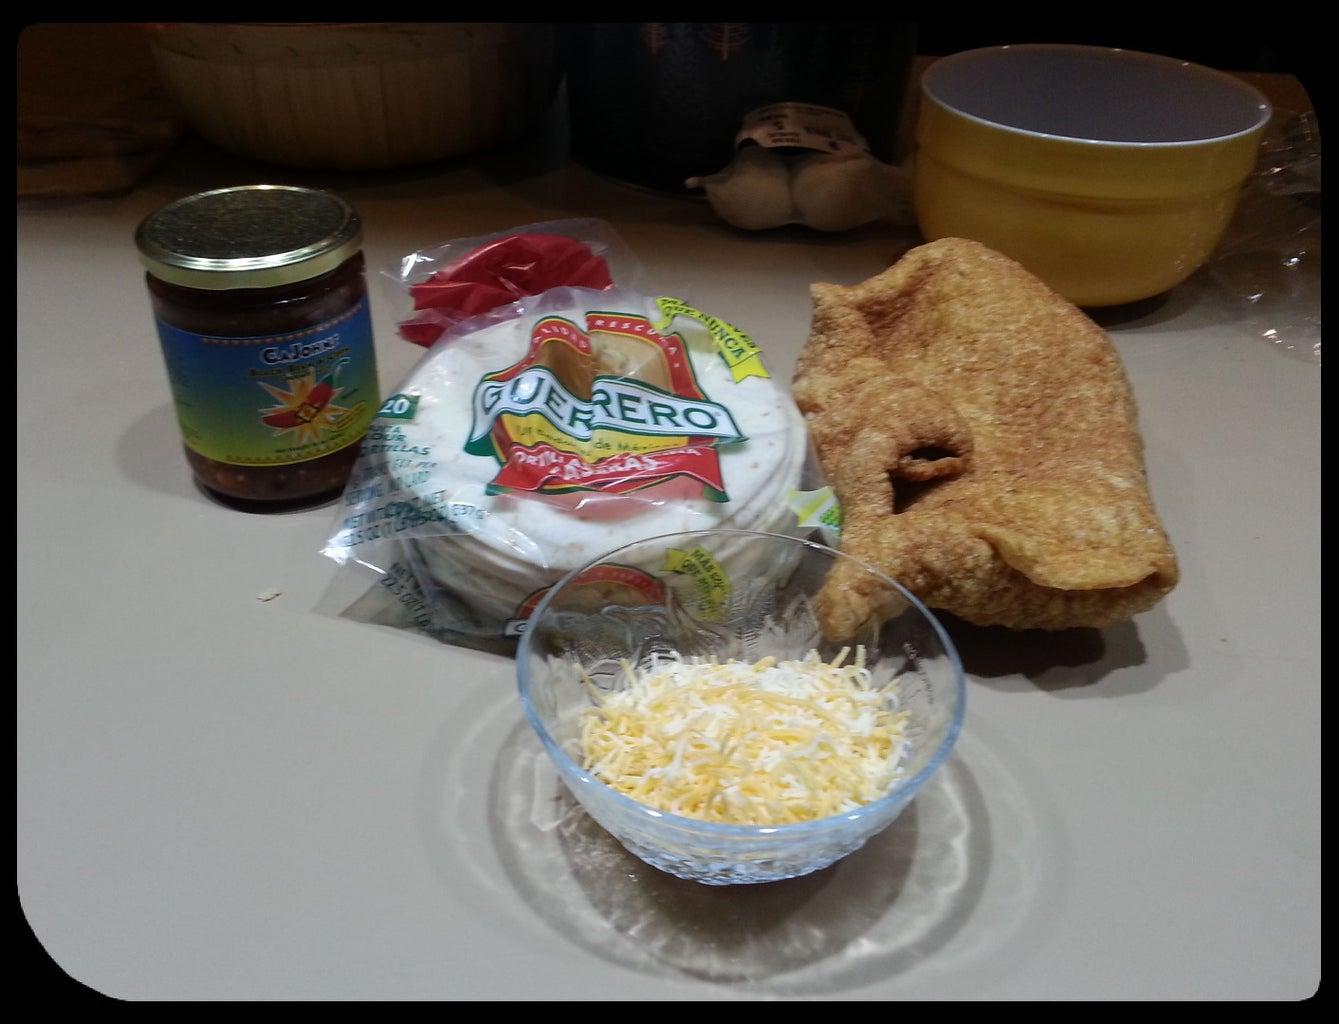 Pork Rind (chicharrones) Tacos